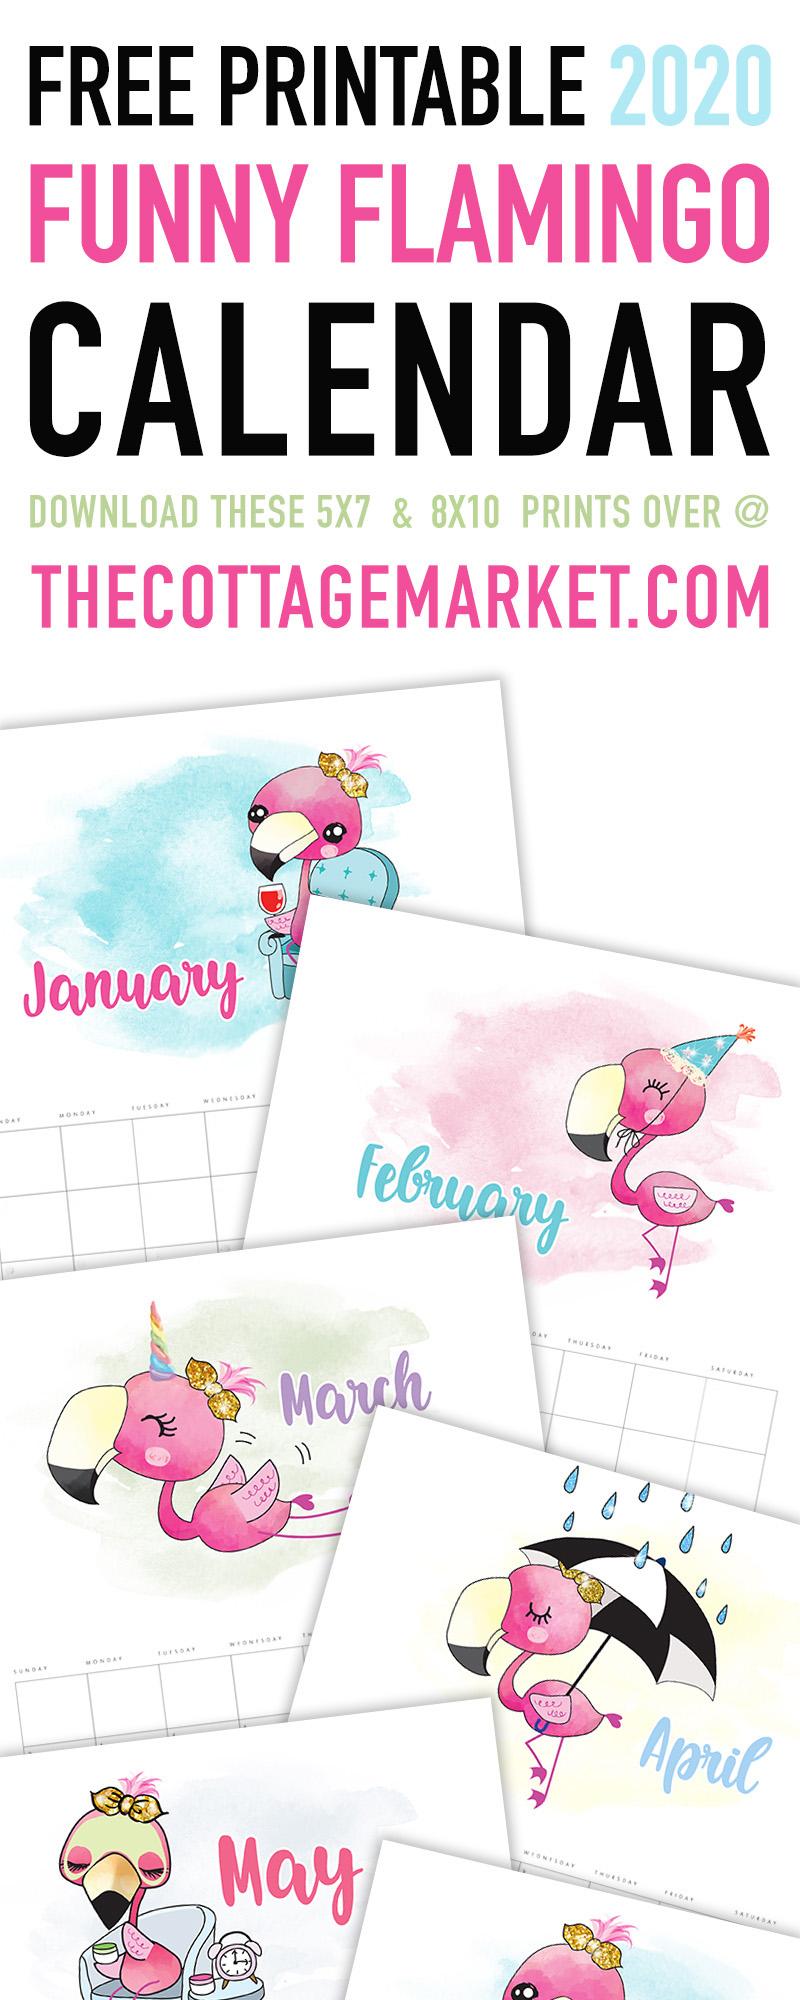 https://thecottagemarket.com/wp-content/uploads/2019/12/tcm-flamingo-calendar-t-1.jpg